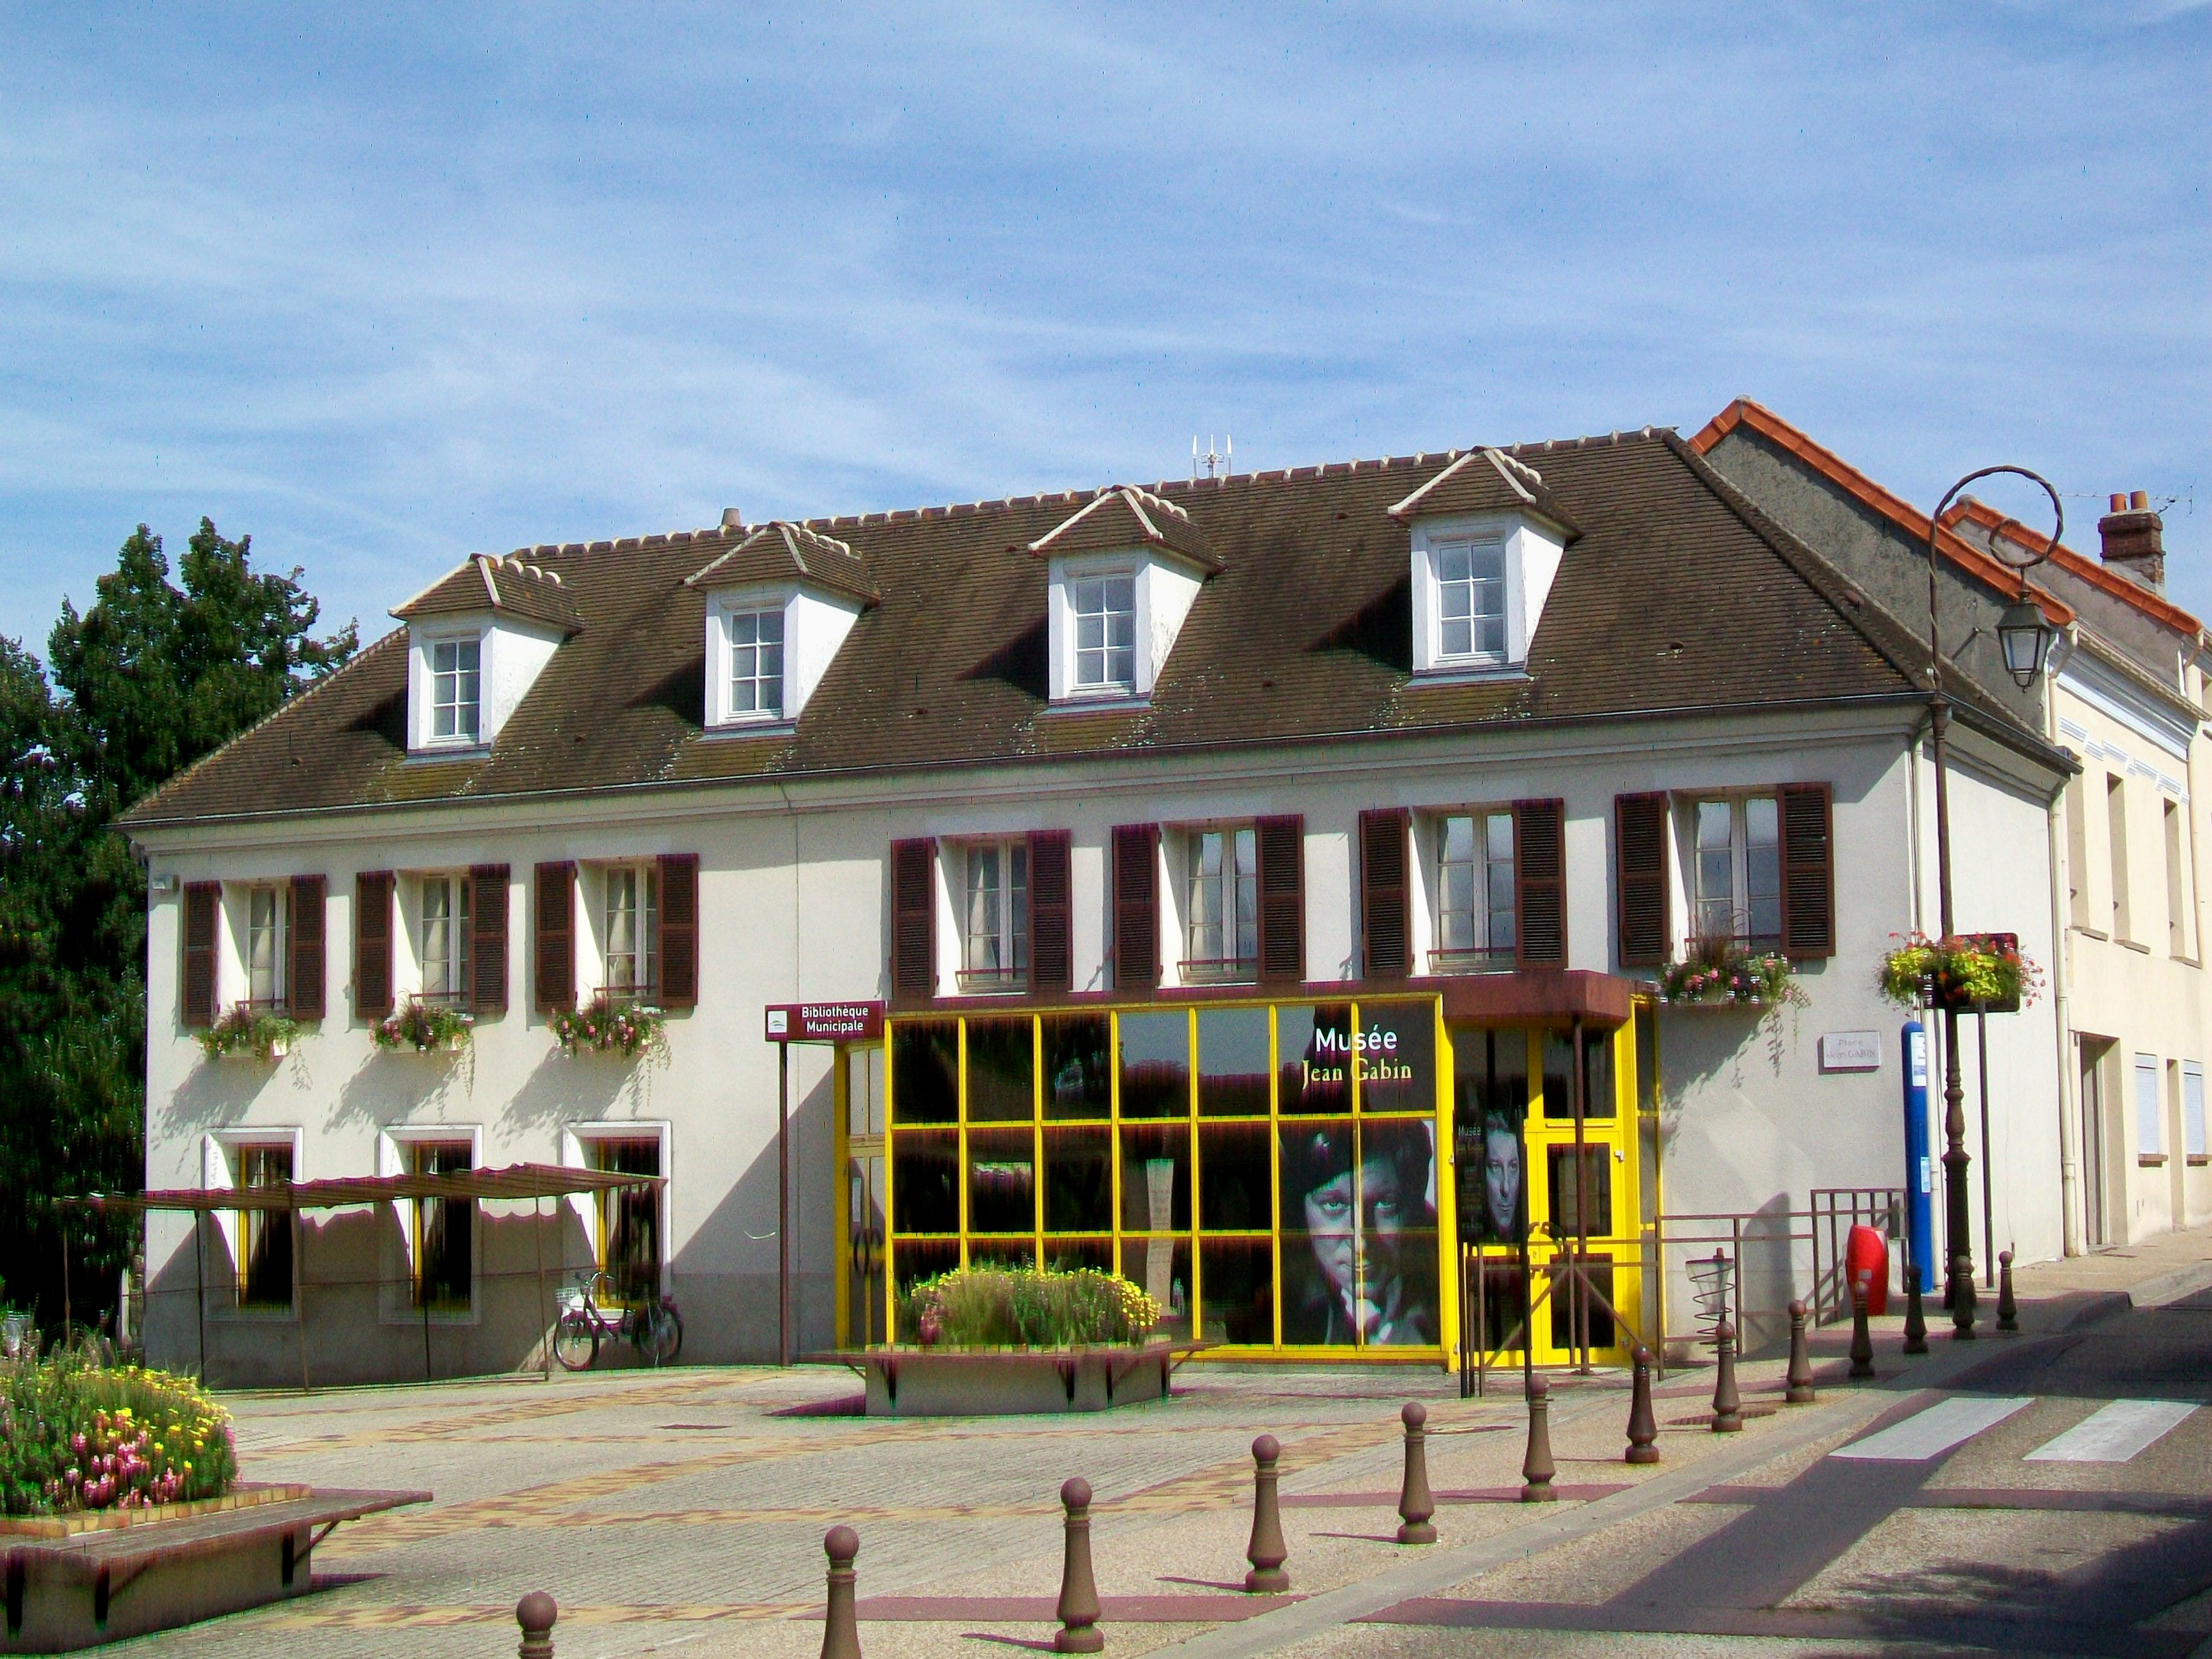 mériel-95-musée-jean-gabin-et-bibliothèque-municipale-grande